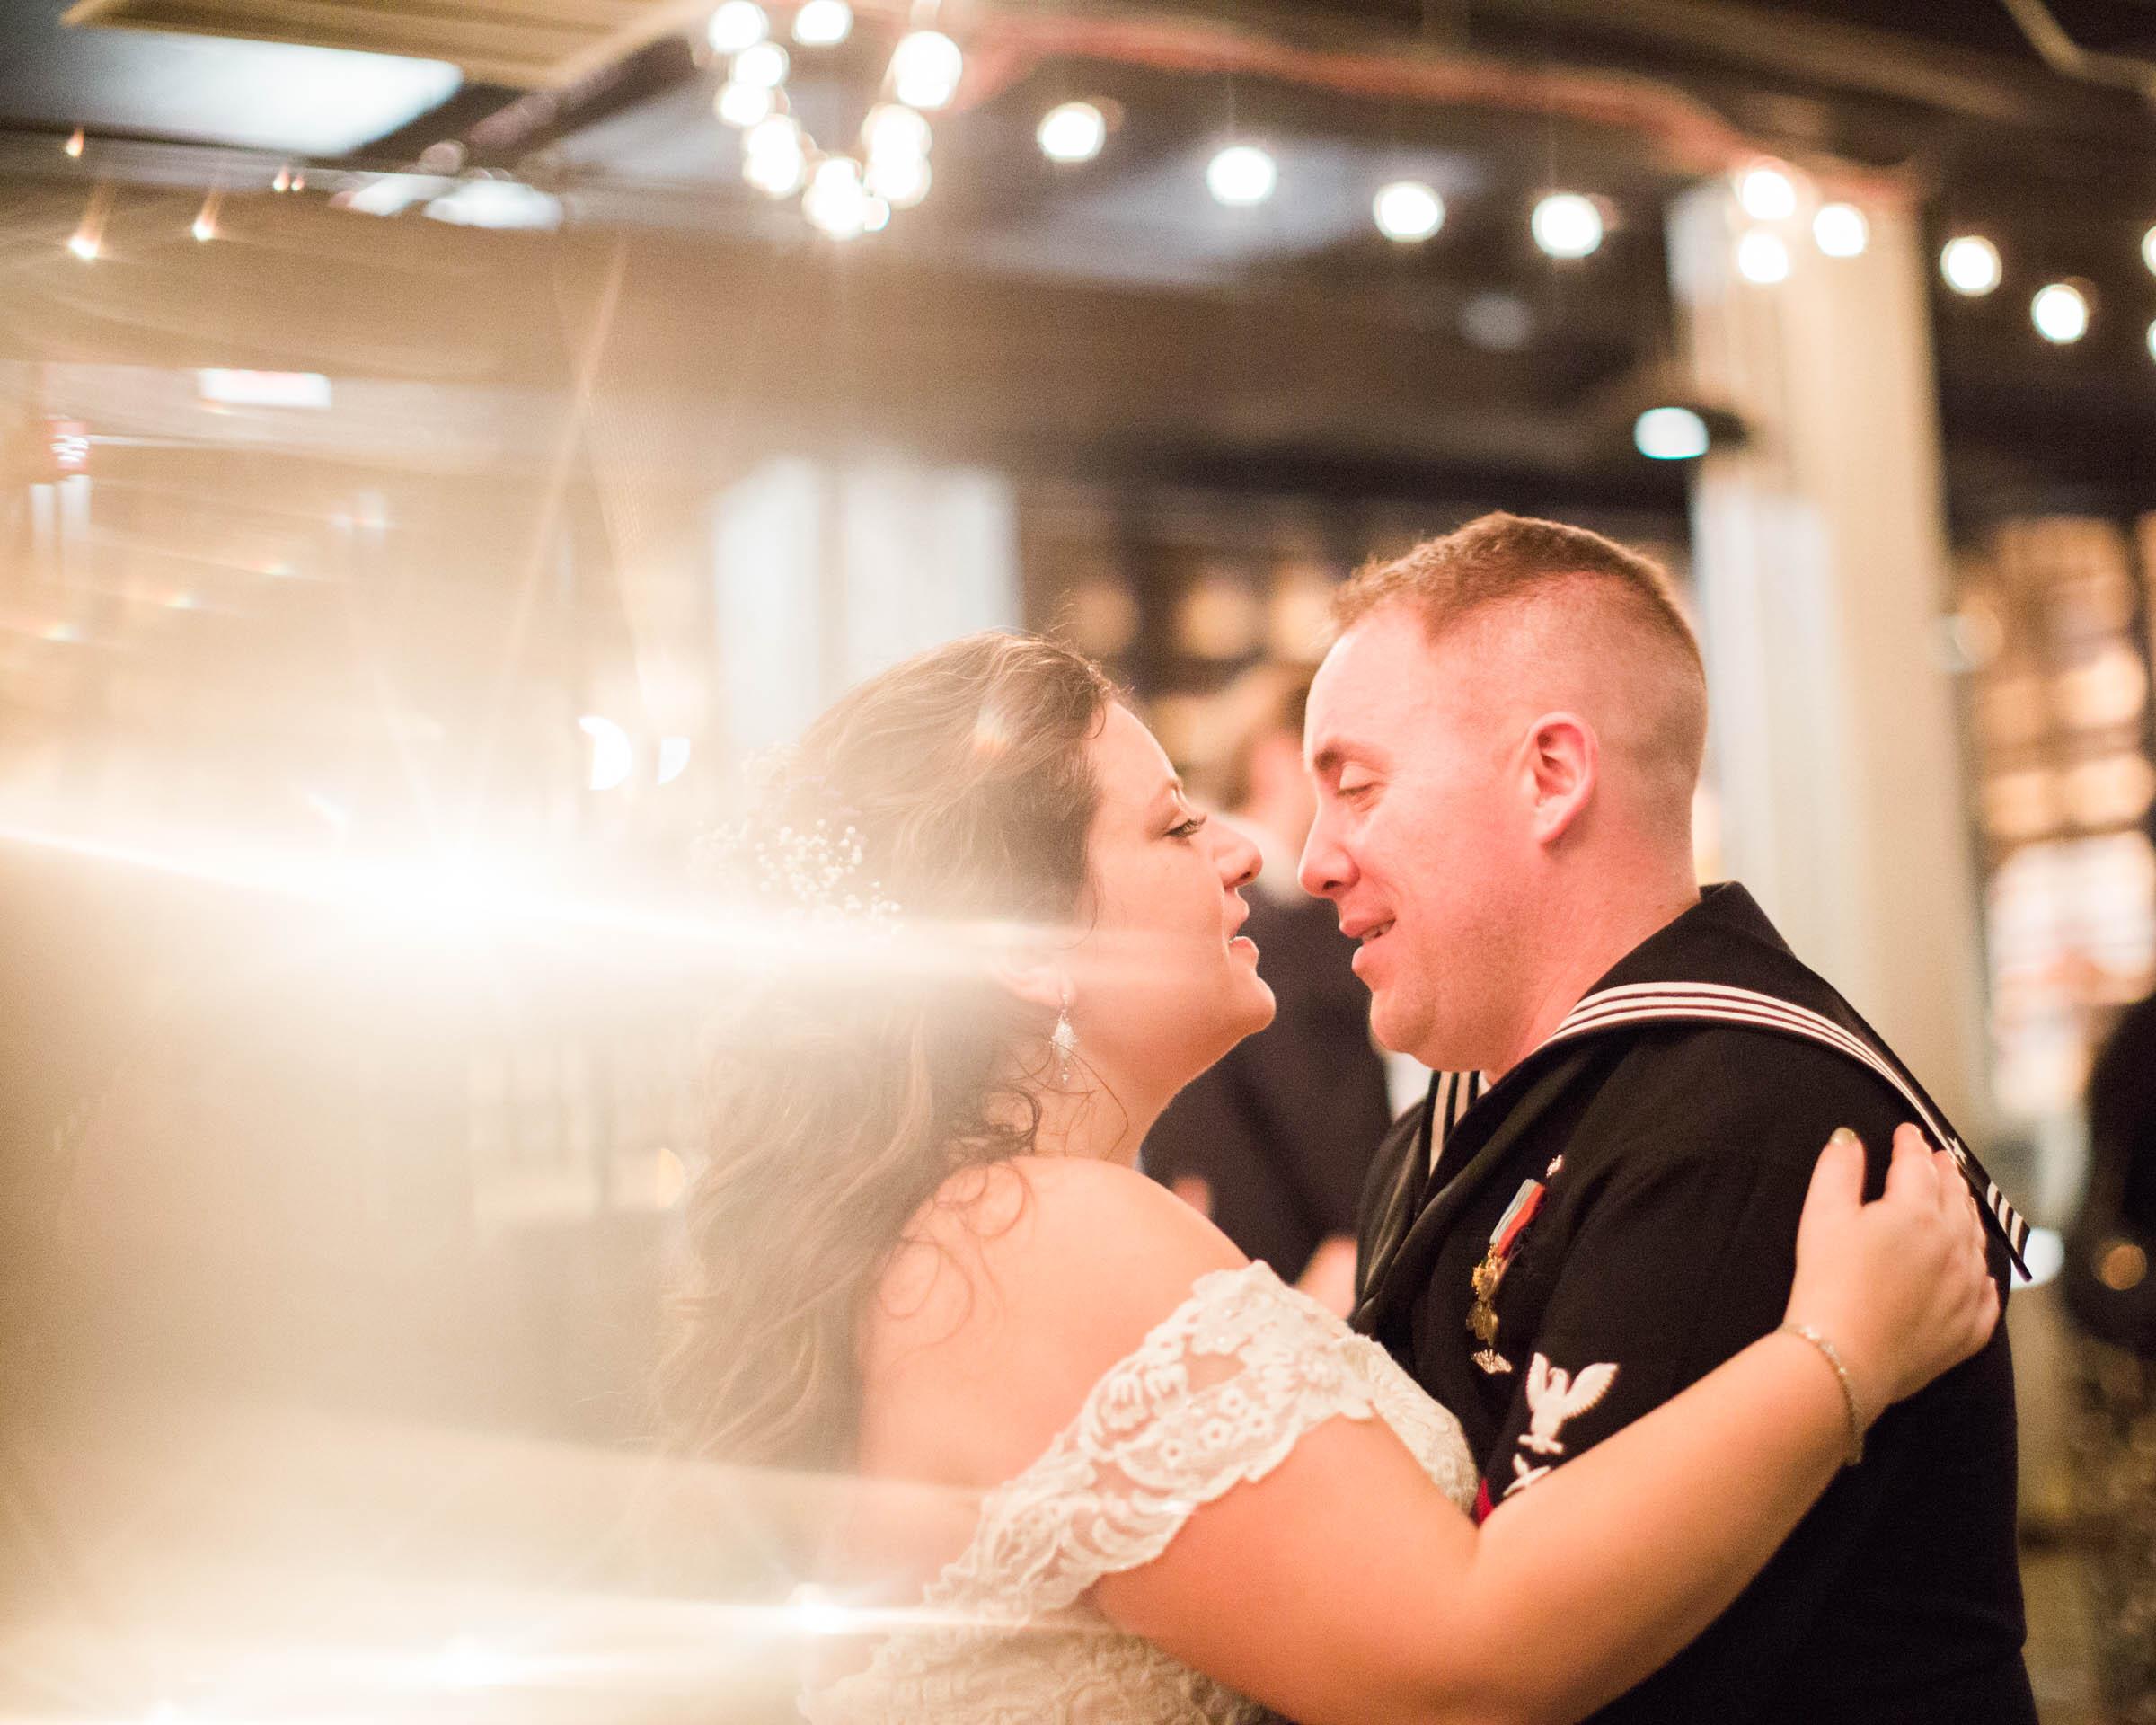 Best Wedding Photographers in Baltimore Maryland Megapixels Media PHOTOGRAPHY (16 of 25).jpg